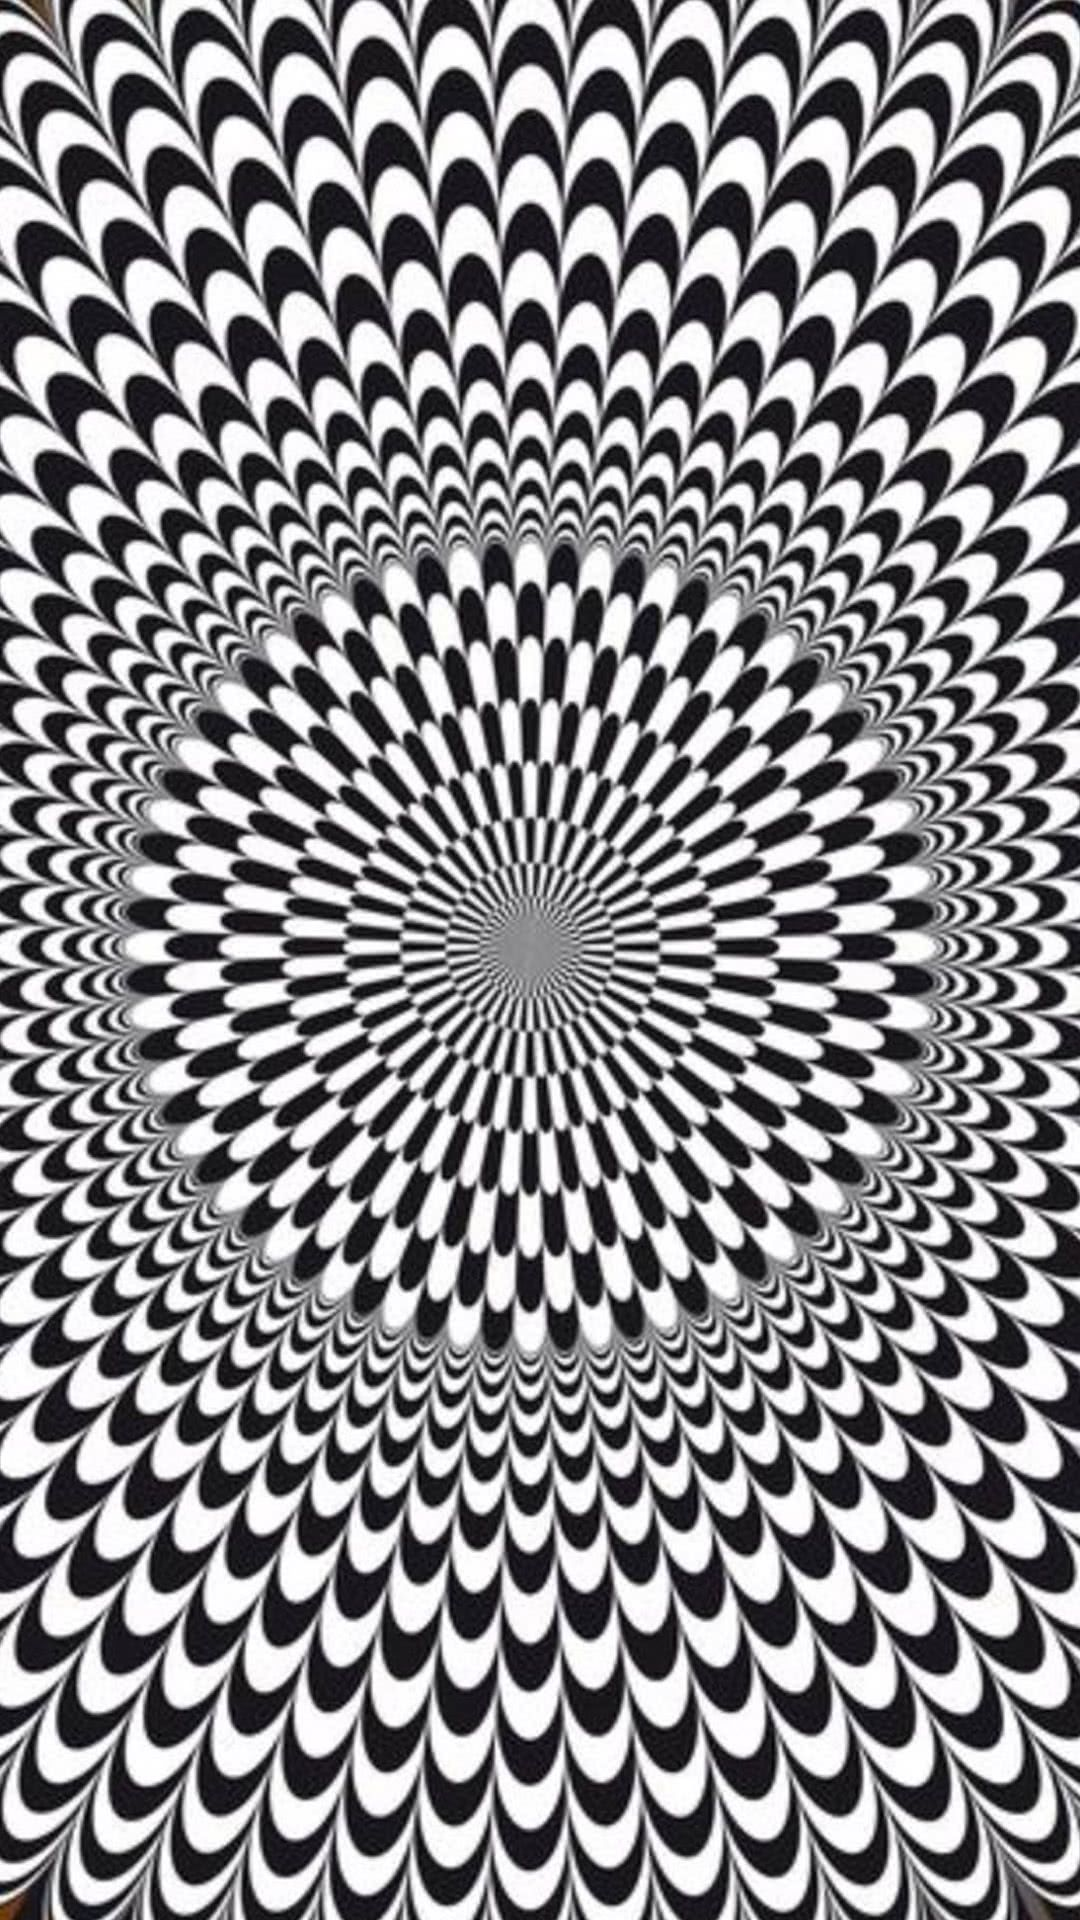 optical illusions # 15